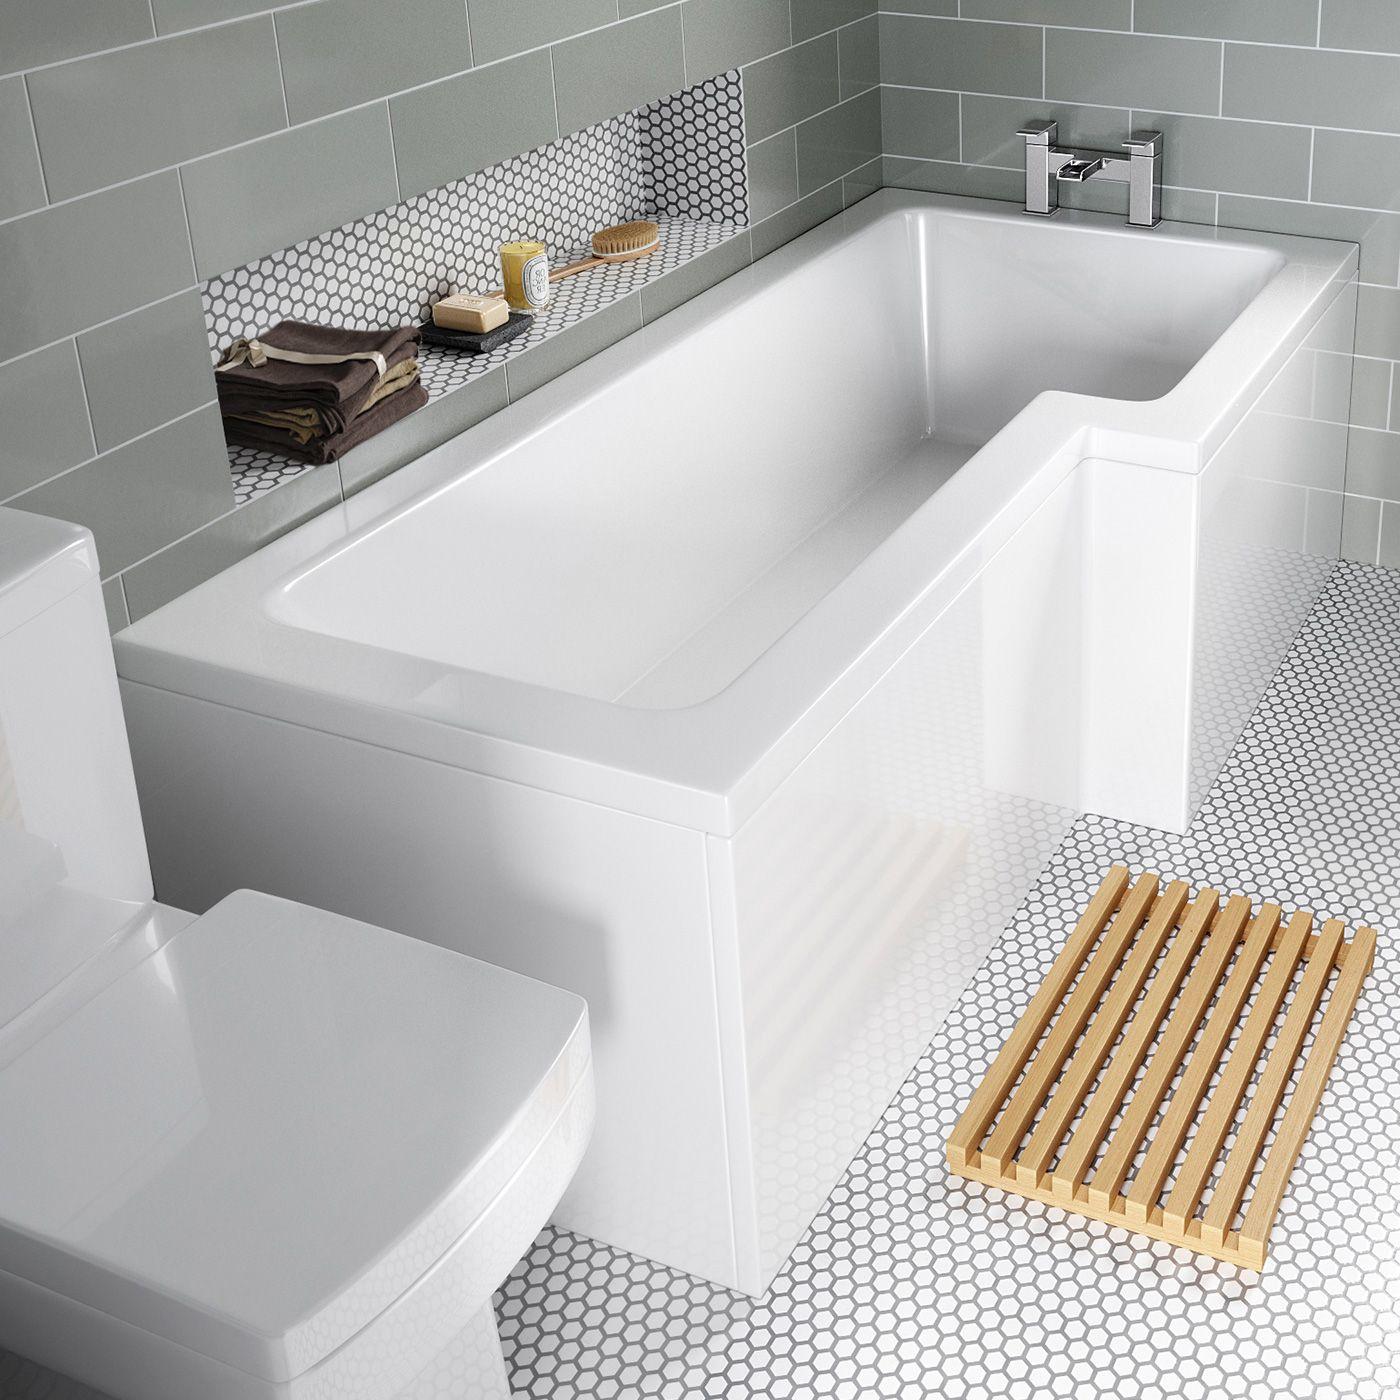 1700x850mm Right Hand L-Shaped Bath | Bathroom | Pinterest | Bath ...